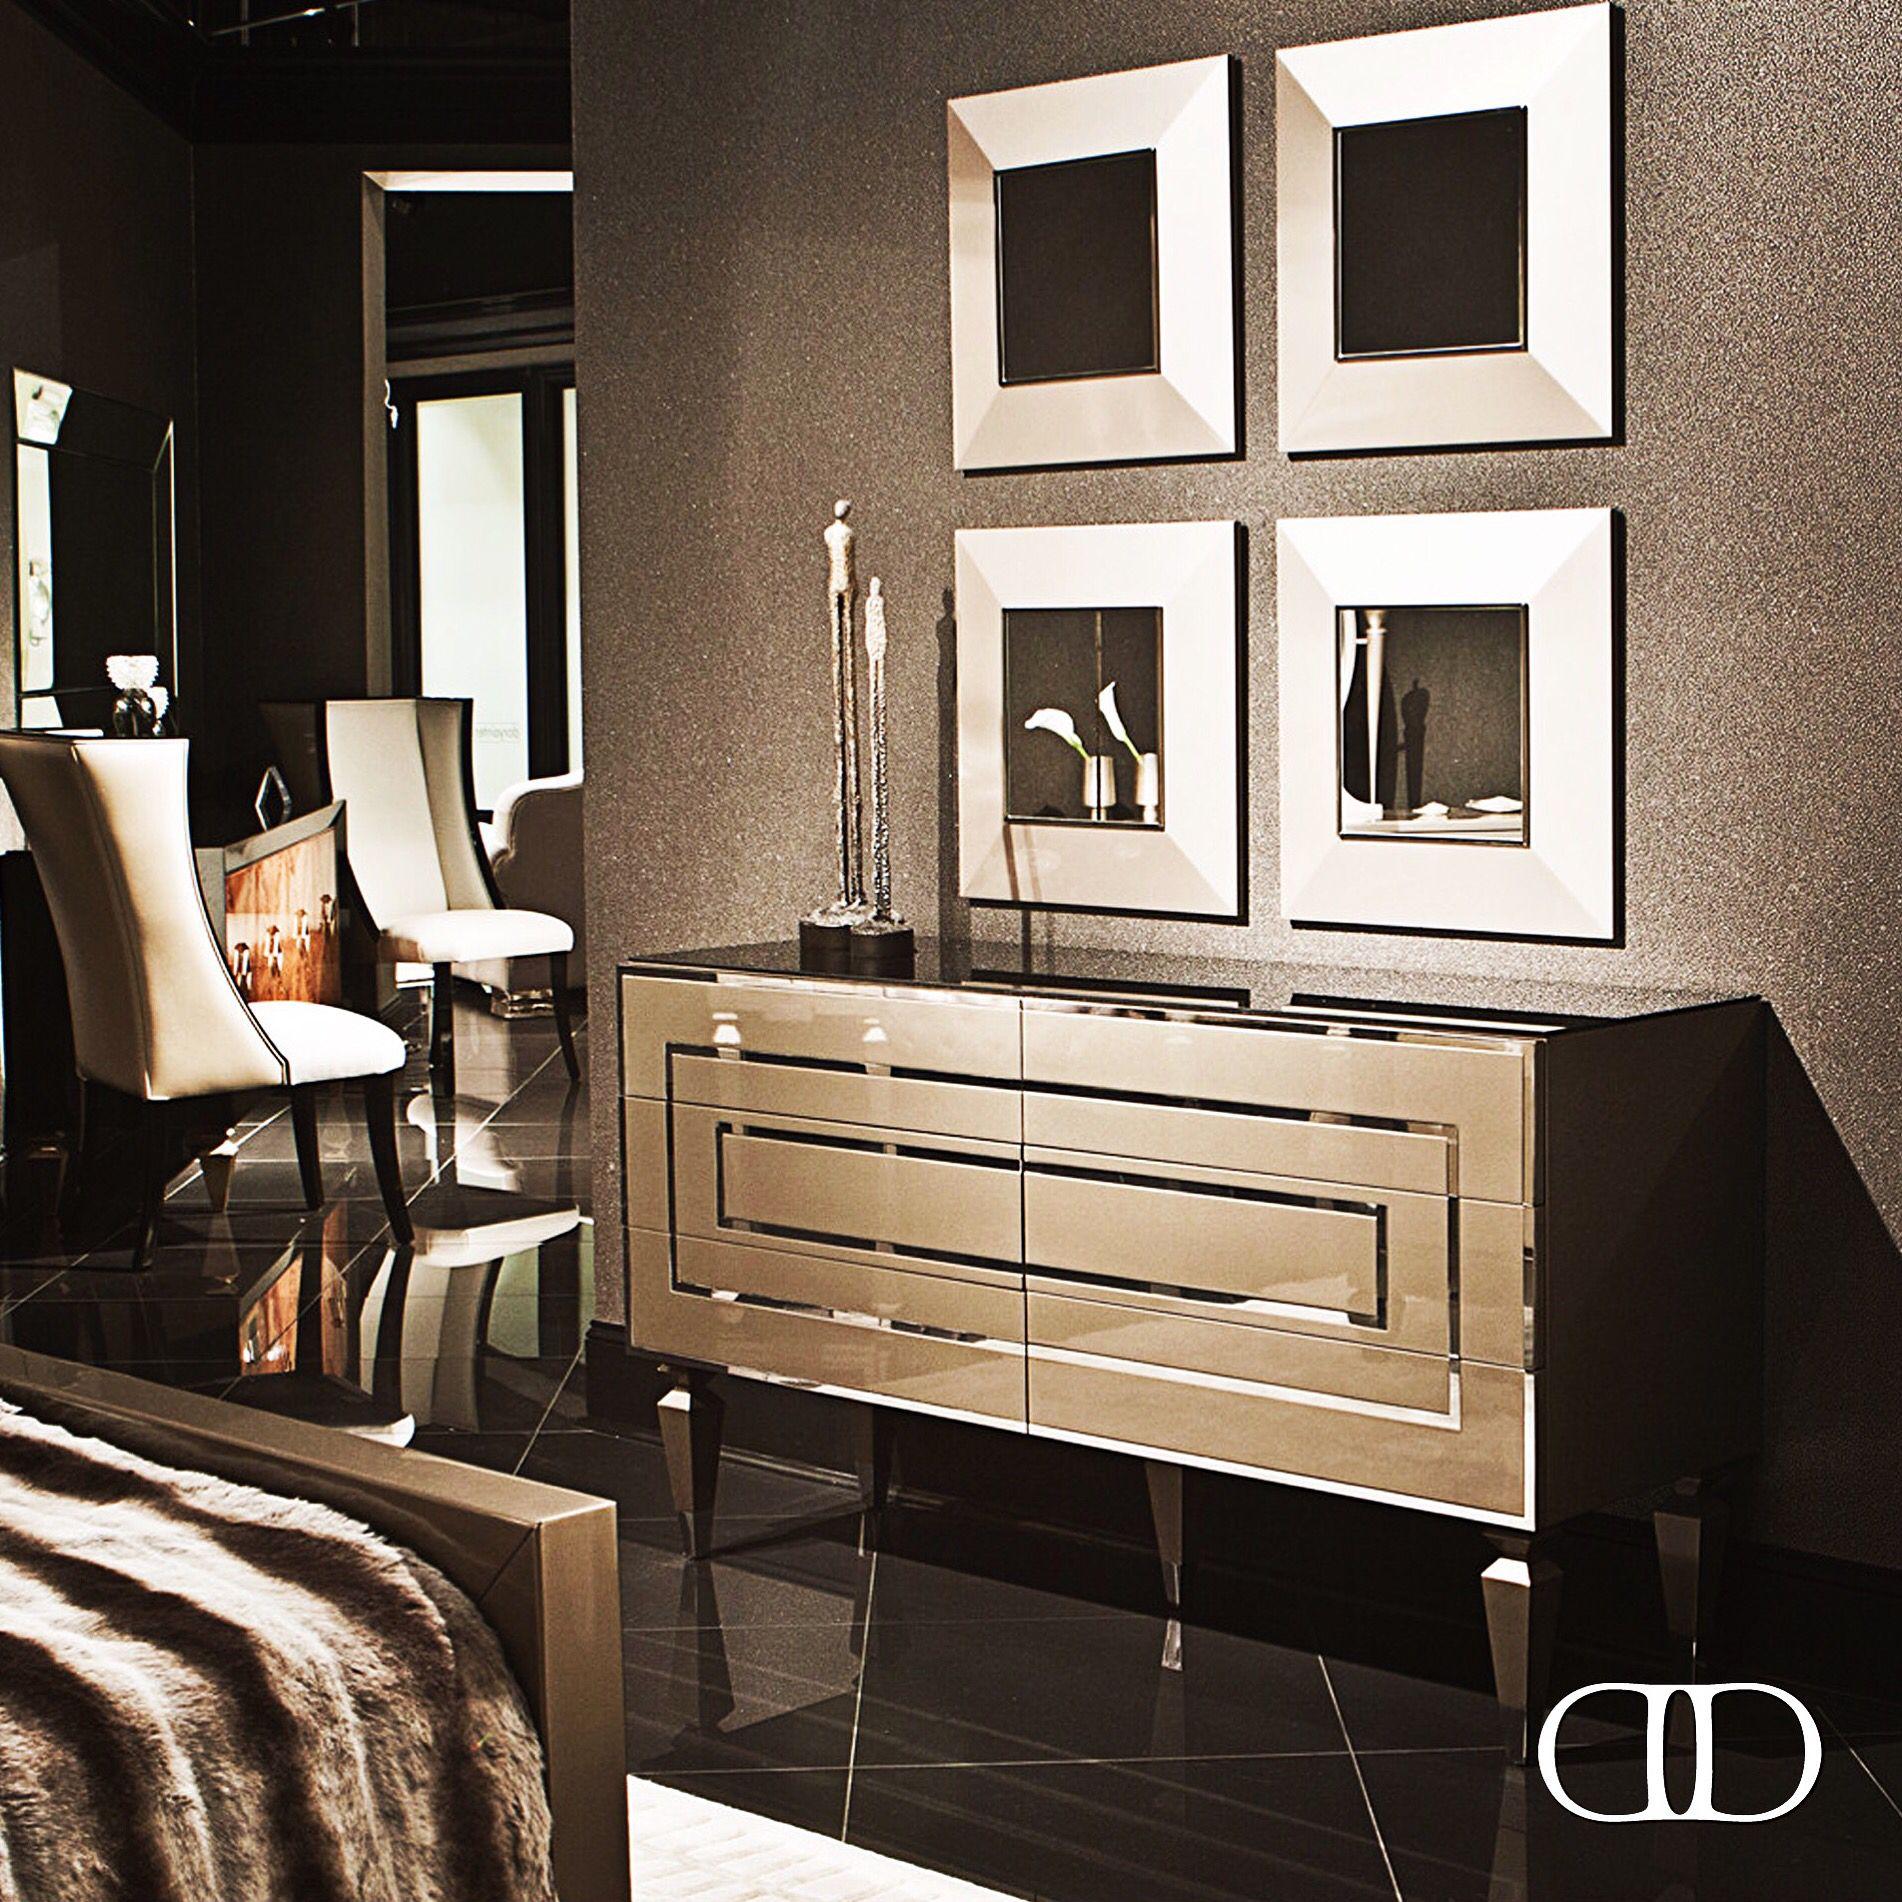 Modern Statement: Dorya's new Simone Chest of Drawers #Dorya #DoryaInteriors #DoryaHome #InteriorDesign #Home #HomeDecor #HomeFashion #Design #Style #Luxury #LuxuryLifestyle #Trend #Trending #ChicDesign #LuxuriousBedrooms